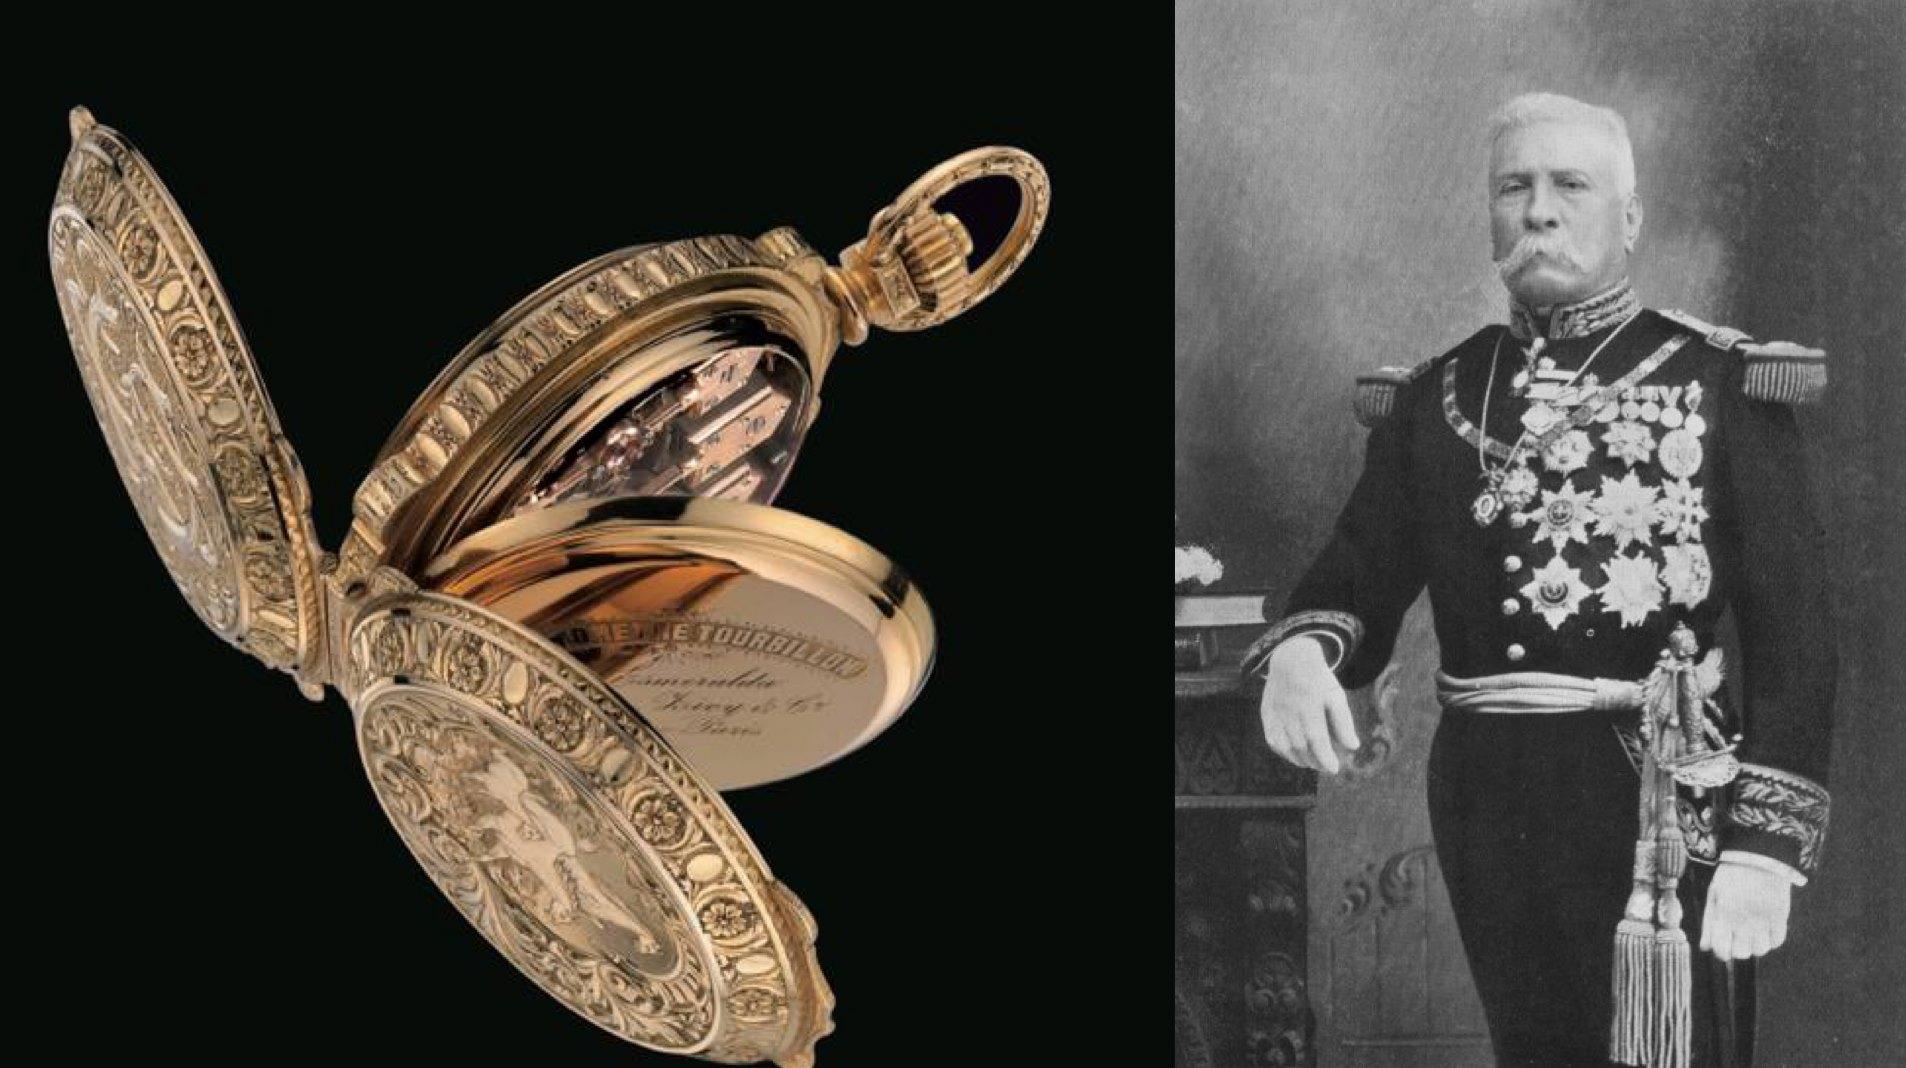 La verdadera historia del reloj de Porfirio Diaz - La Esmeralda de Girard Perregaux